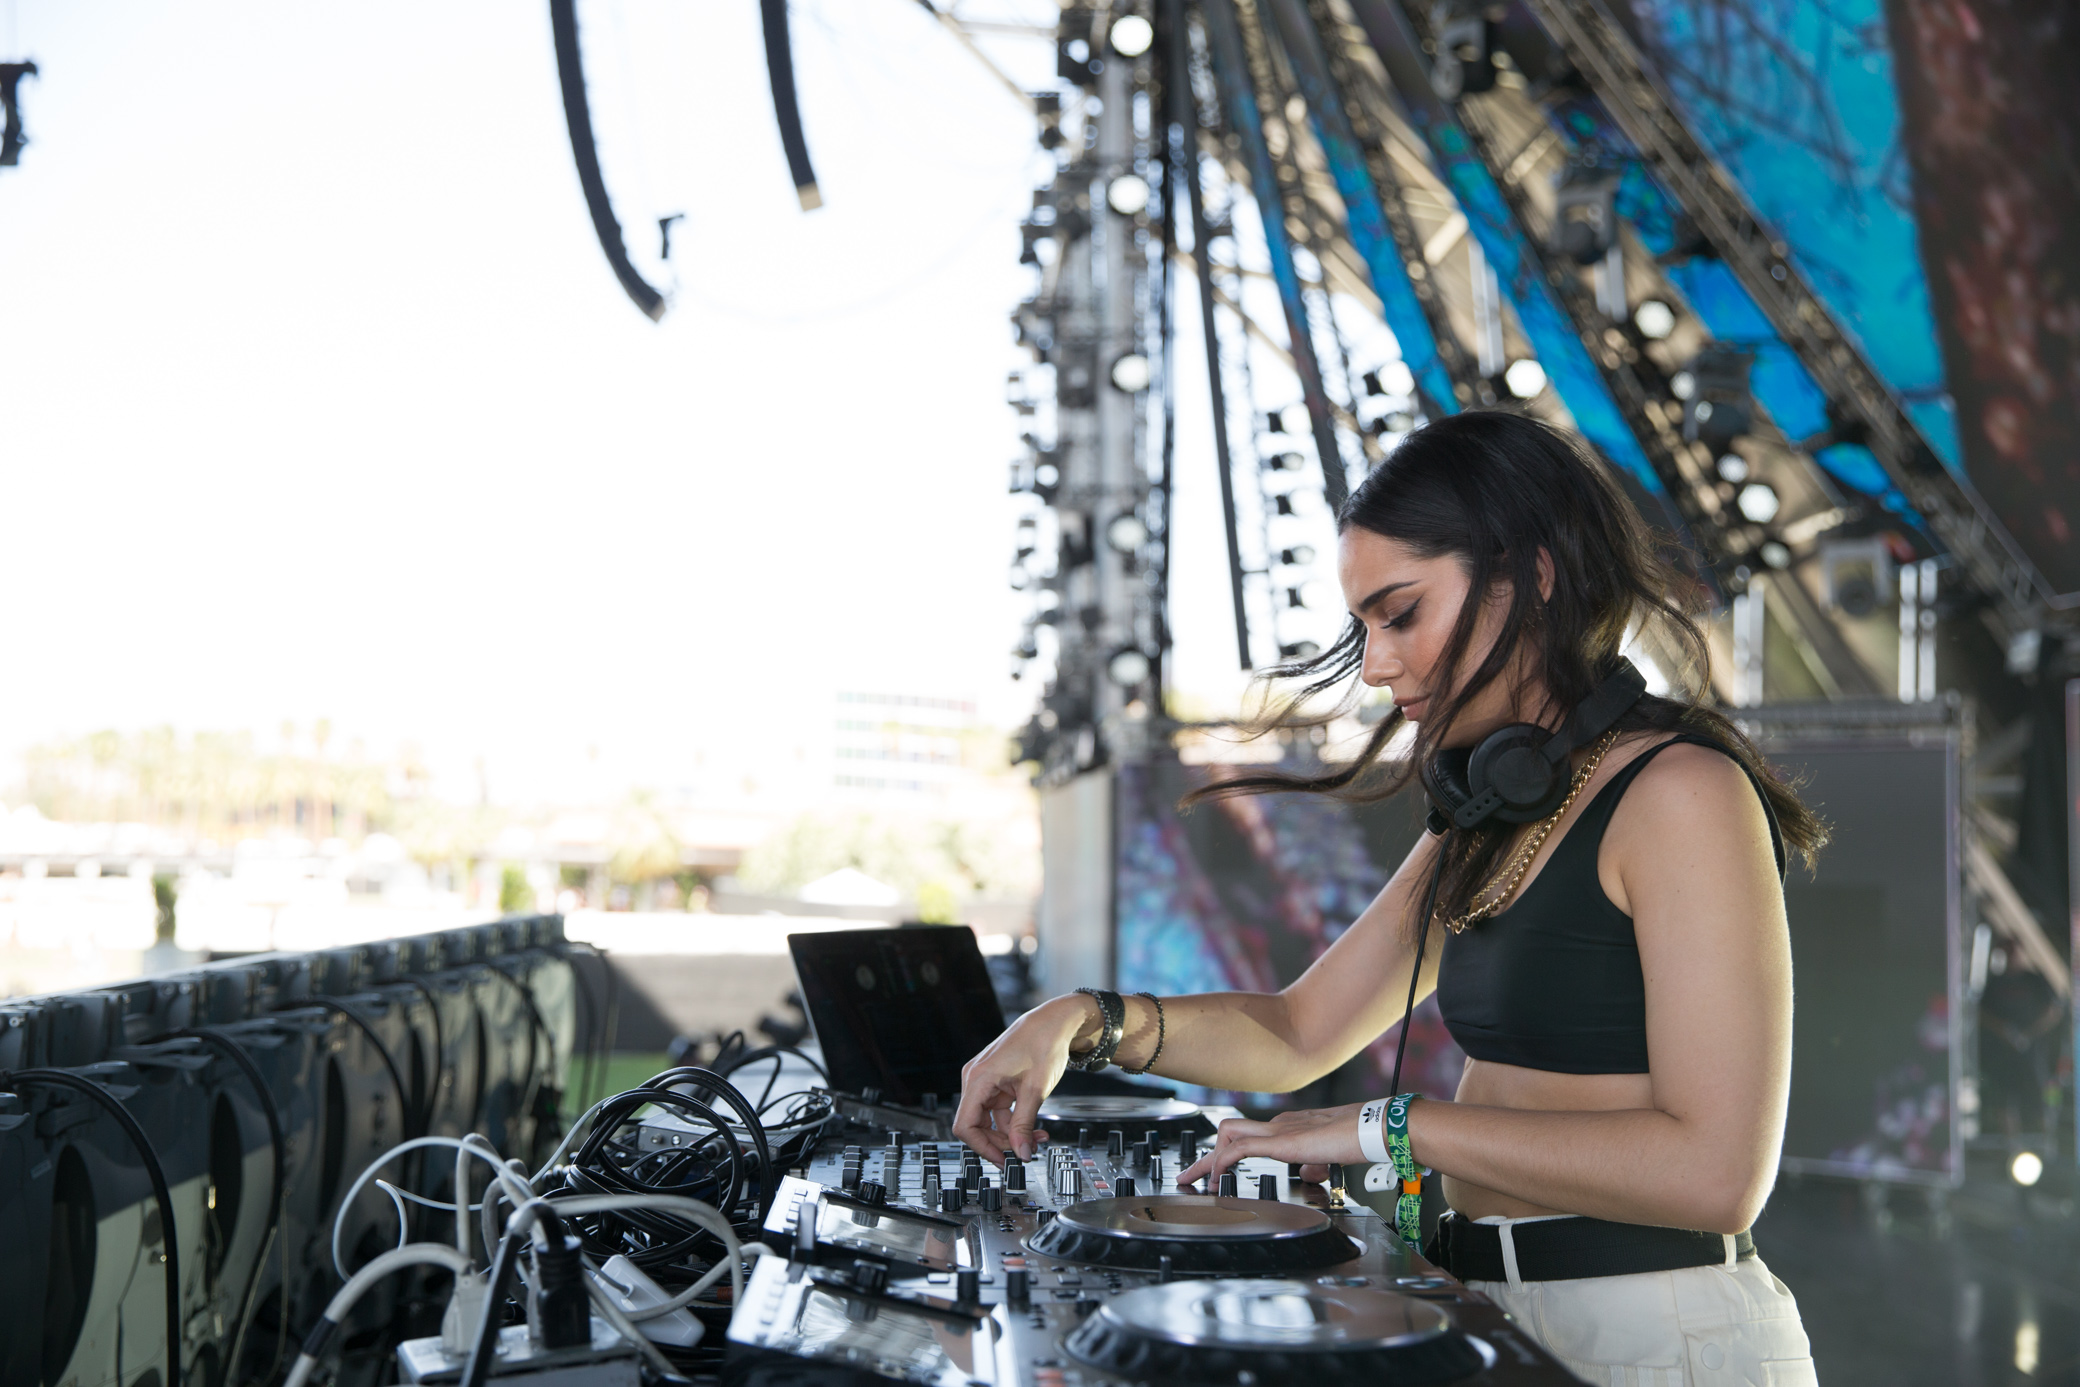 Coachella-Wk1-Music-Festival-002.jpg